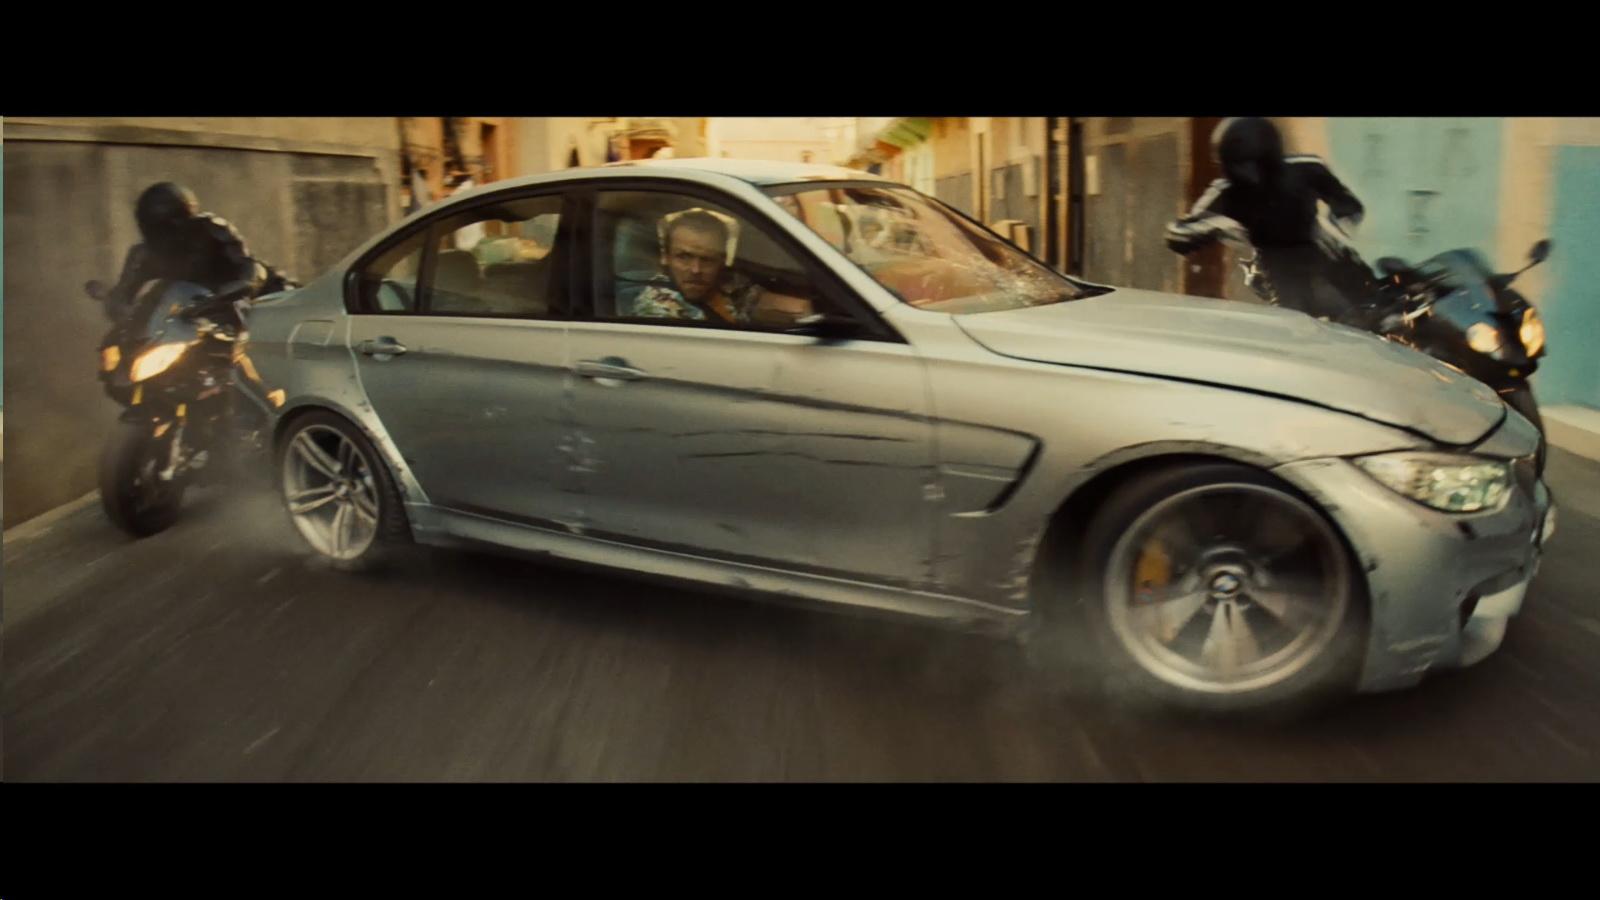 2017 Dodge Durango Gt >> BMW M3 – Mission: Impossible – Rogue Nation (2015) Movie